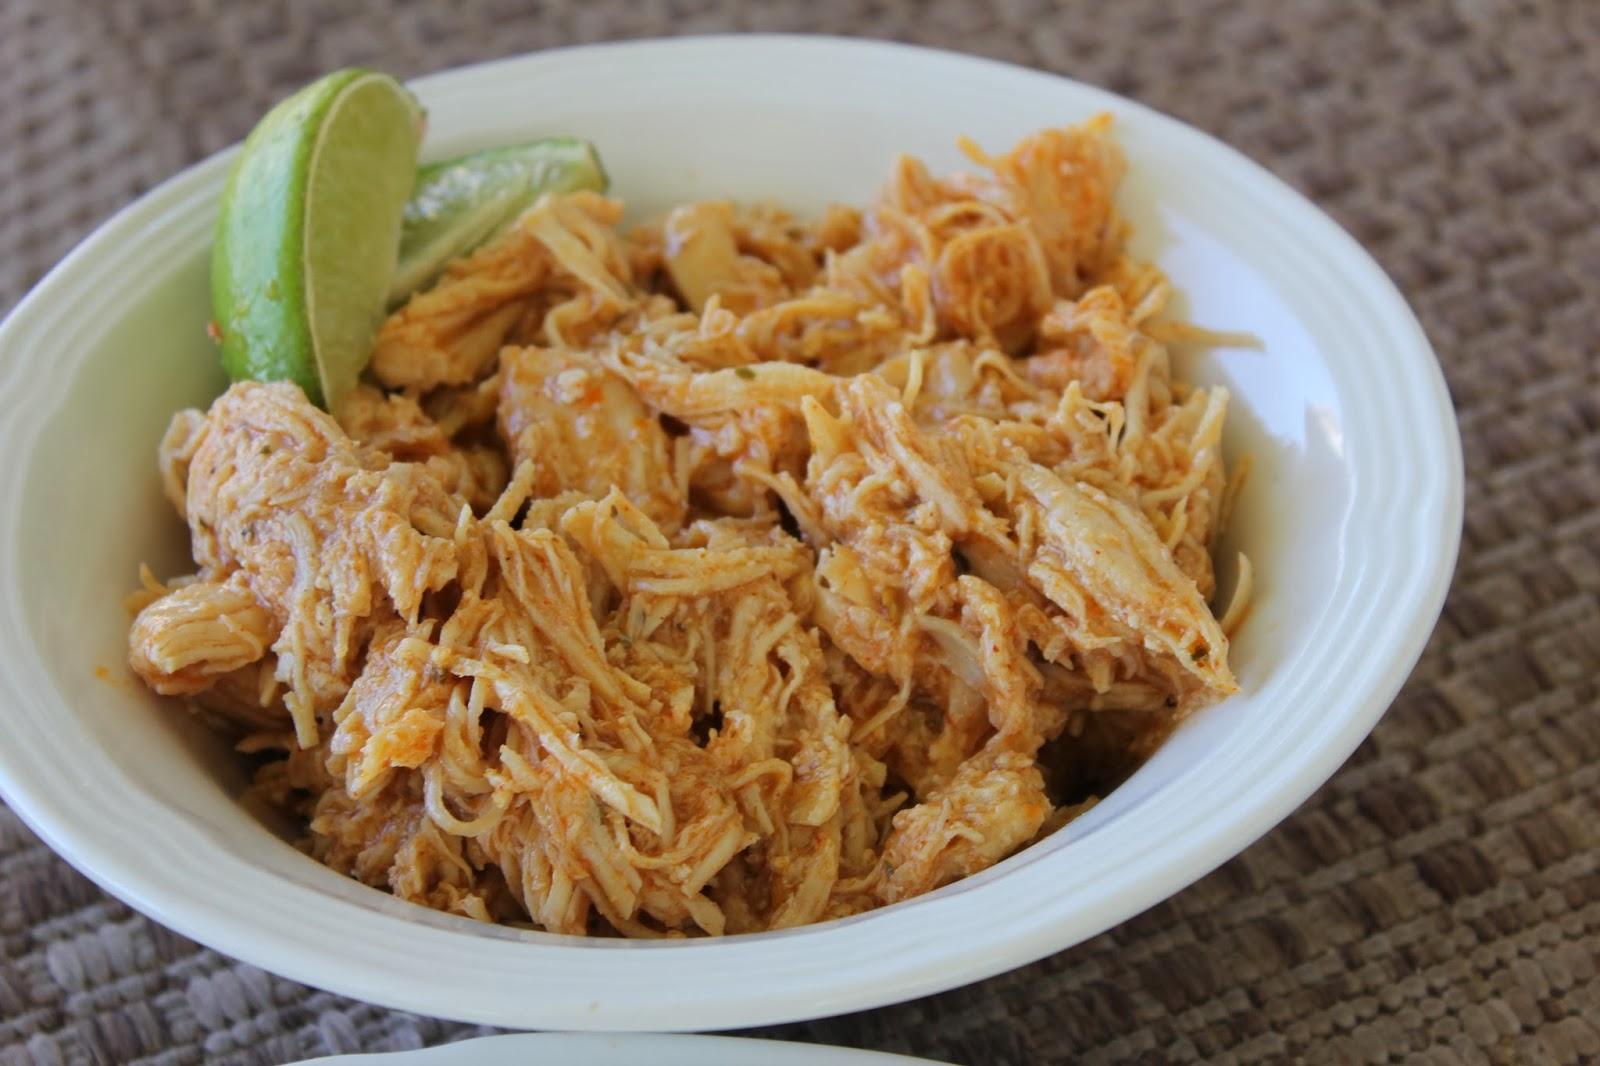 Deals to Meals: Shredded Chicken Tacos (AKA Cafe Rio Chicken)